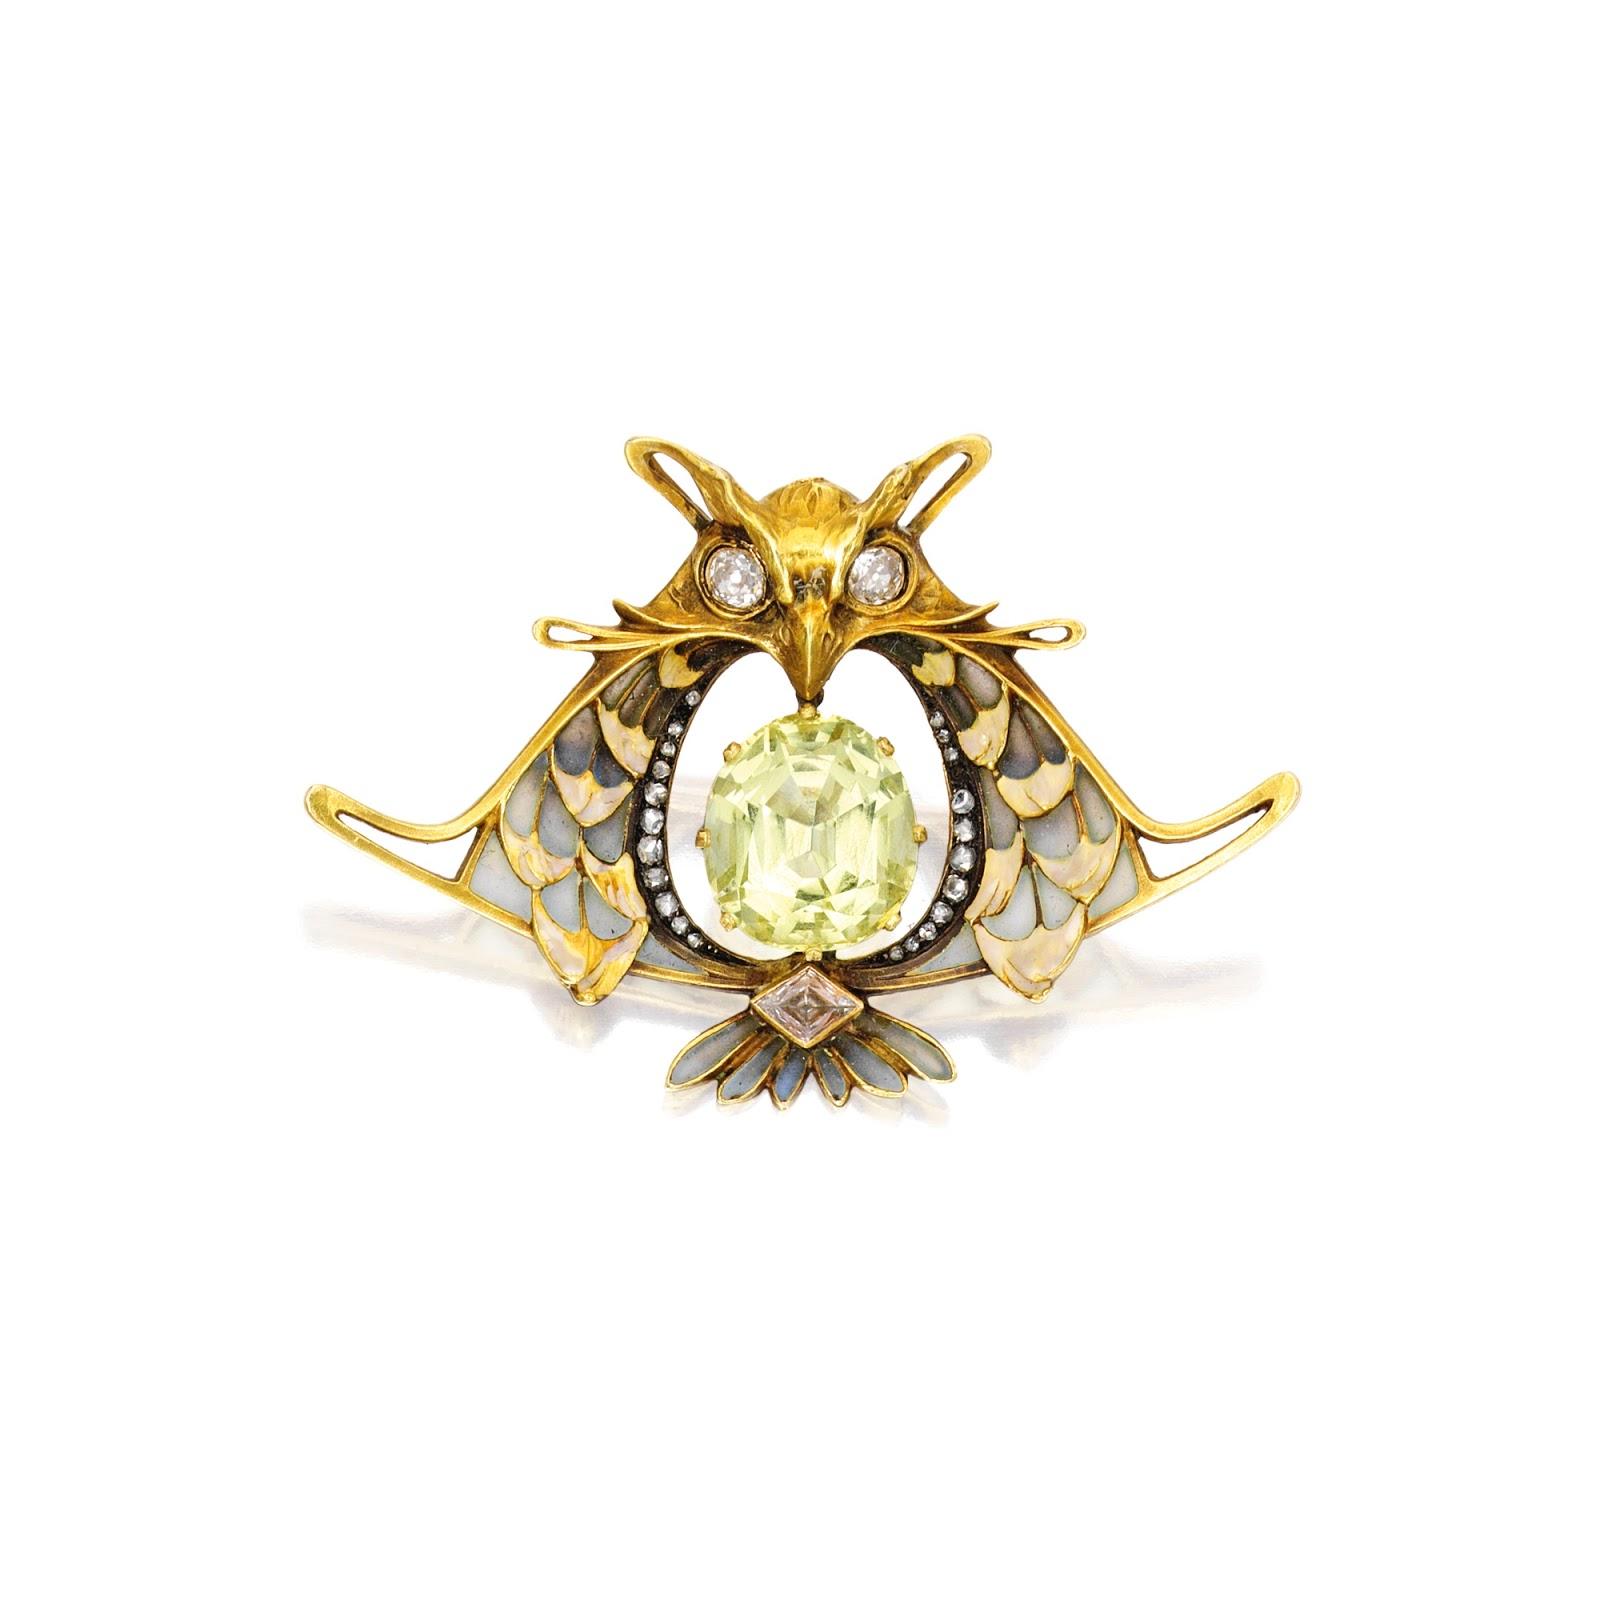 Tiffany Russian Wedding Ring 93 Elegant An karat gold golden